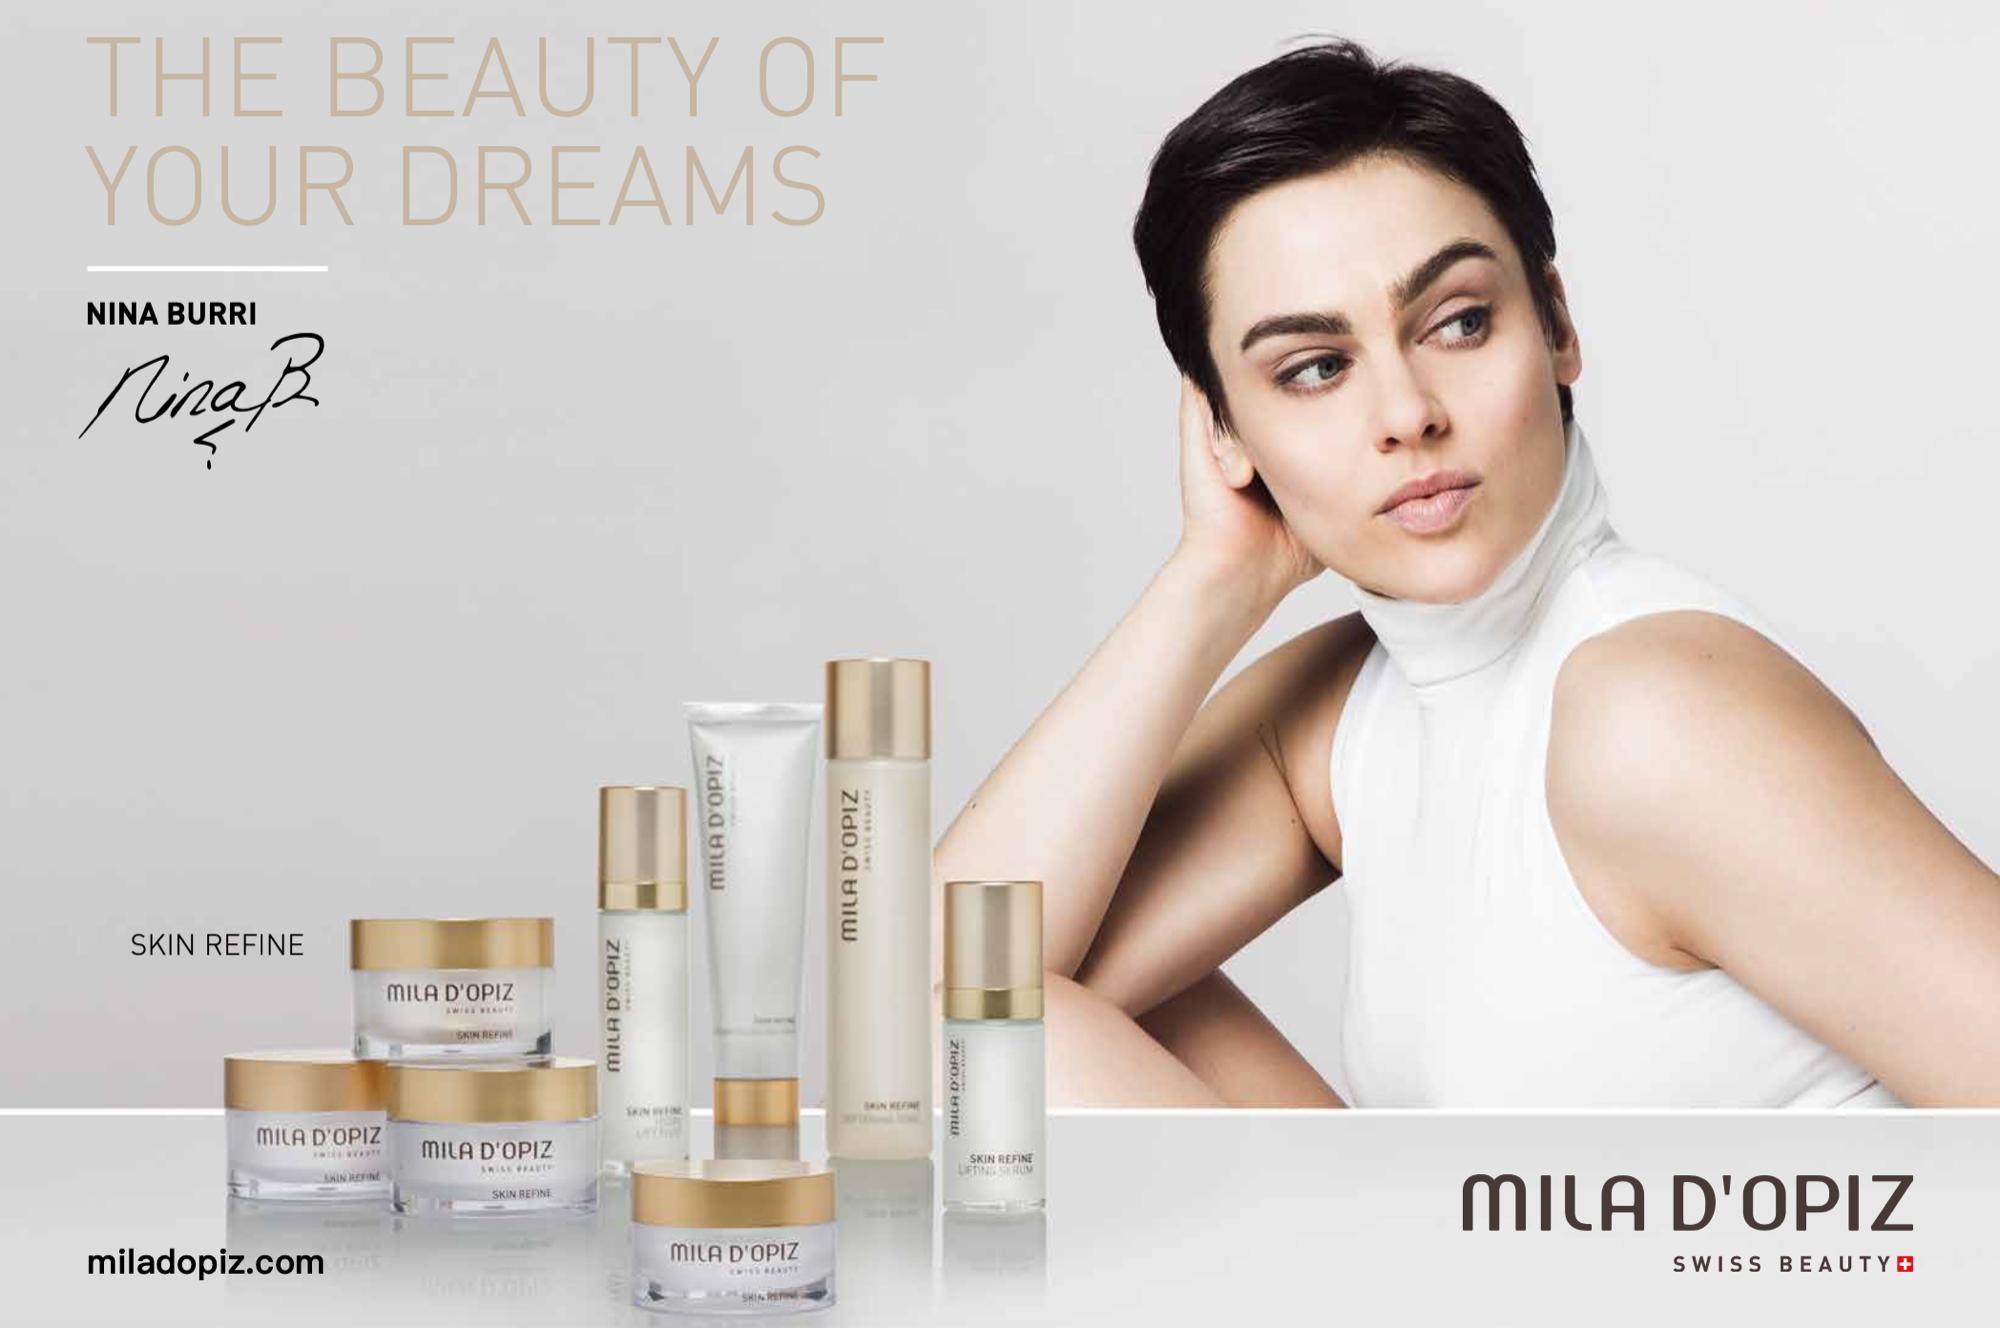 Hair, Nail, Make-up und Fashion styling portfolio / fabienne-pauli - werbung-mila-d-opiz-skin-refine--ID614-1.png?v=1587801040